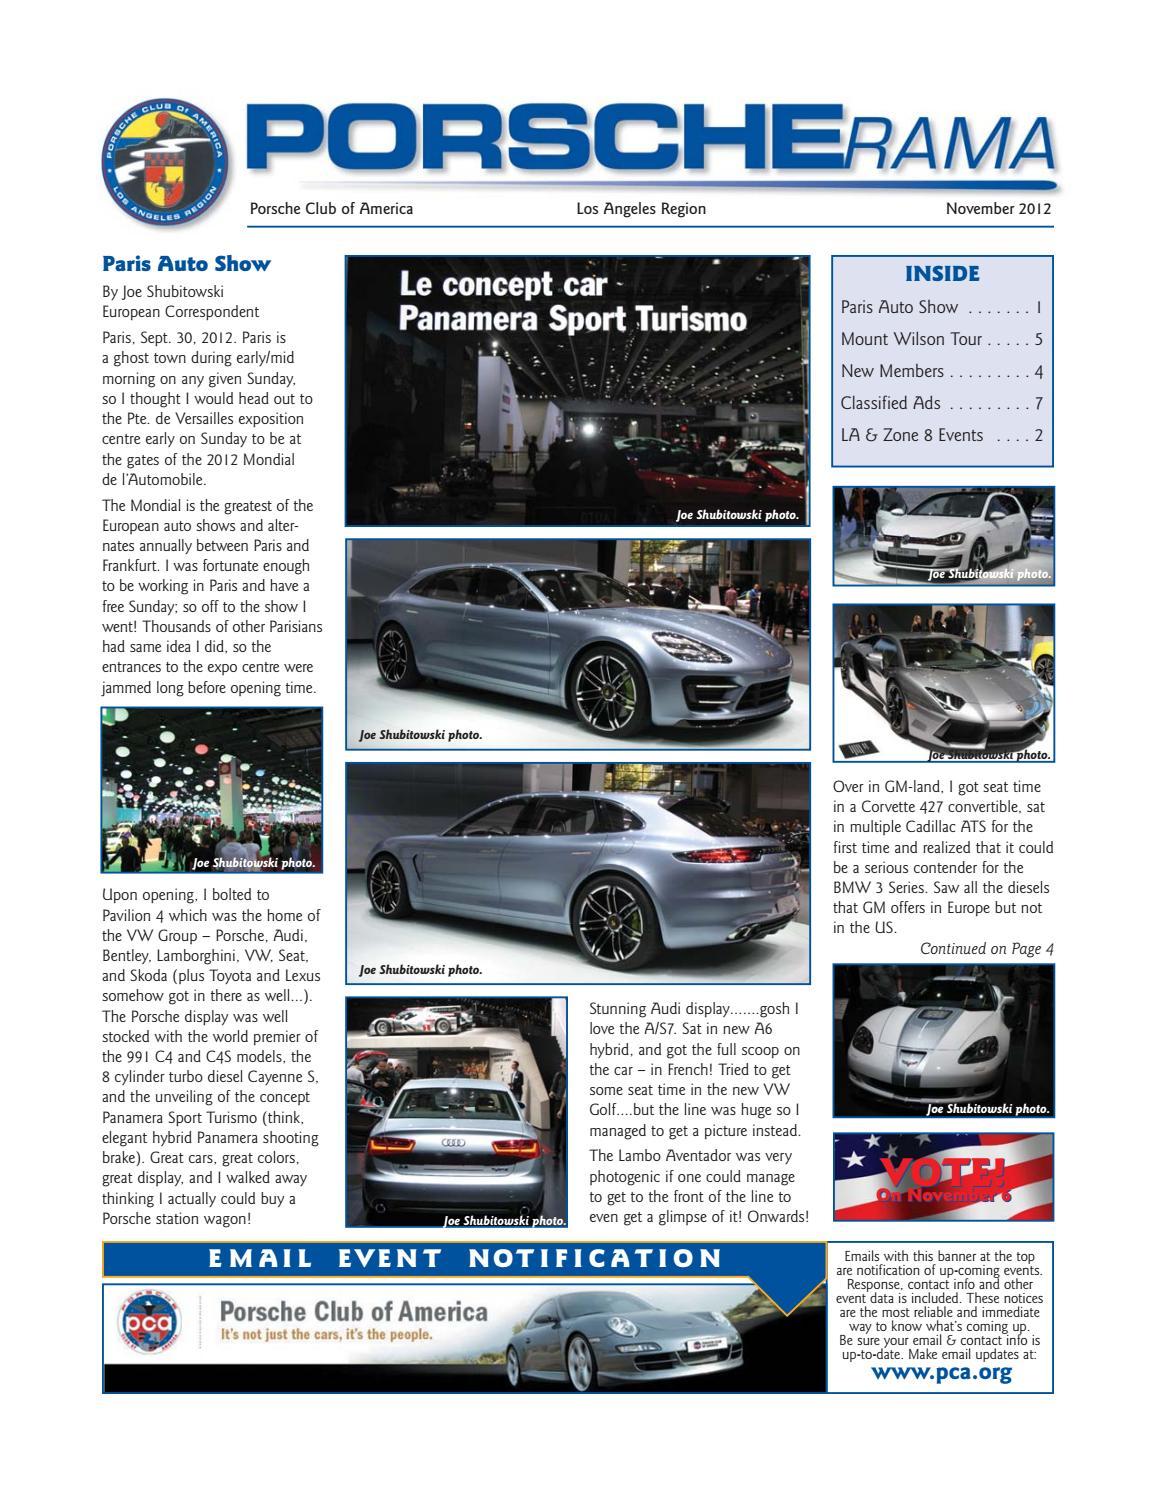 Porscherama 2012 November by Porsche Club of America, Los